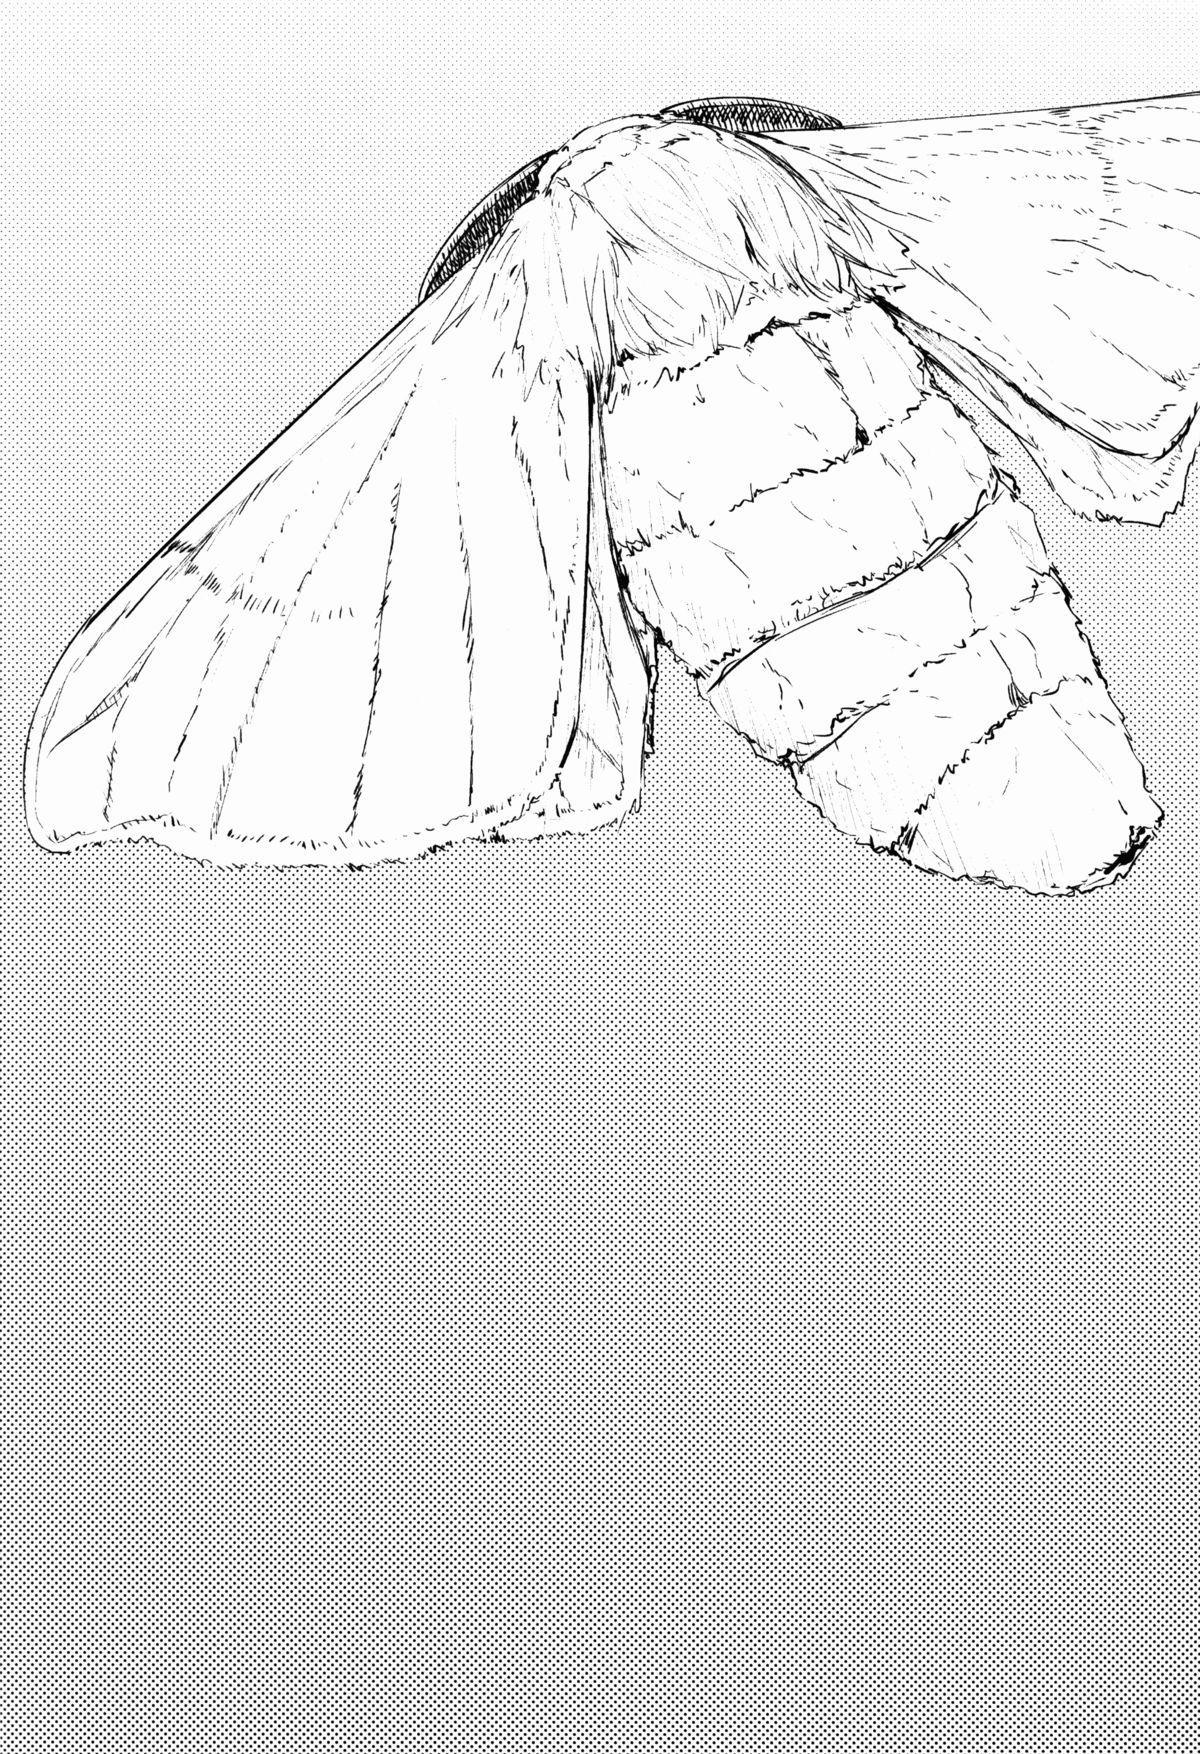 (COMIC1☆9) [Sakekan Memorial (SOLOPIPB)] Shiragasane -Tamoto-   Layers of White 2 [English] [rampantserenity] 2